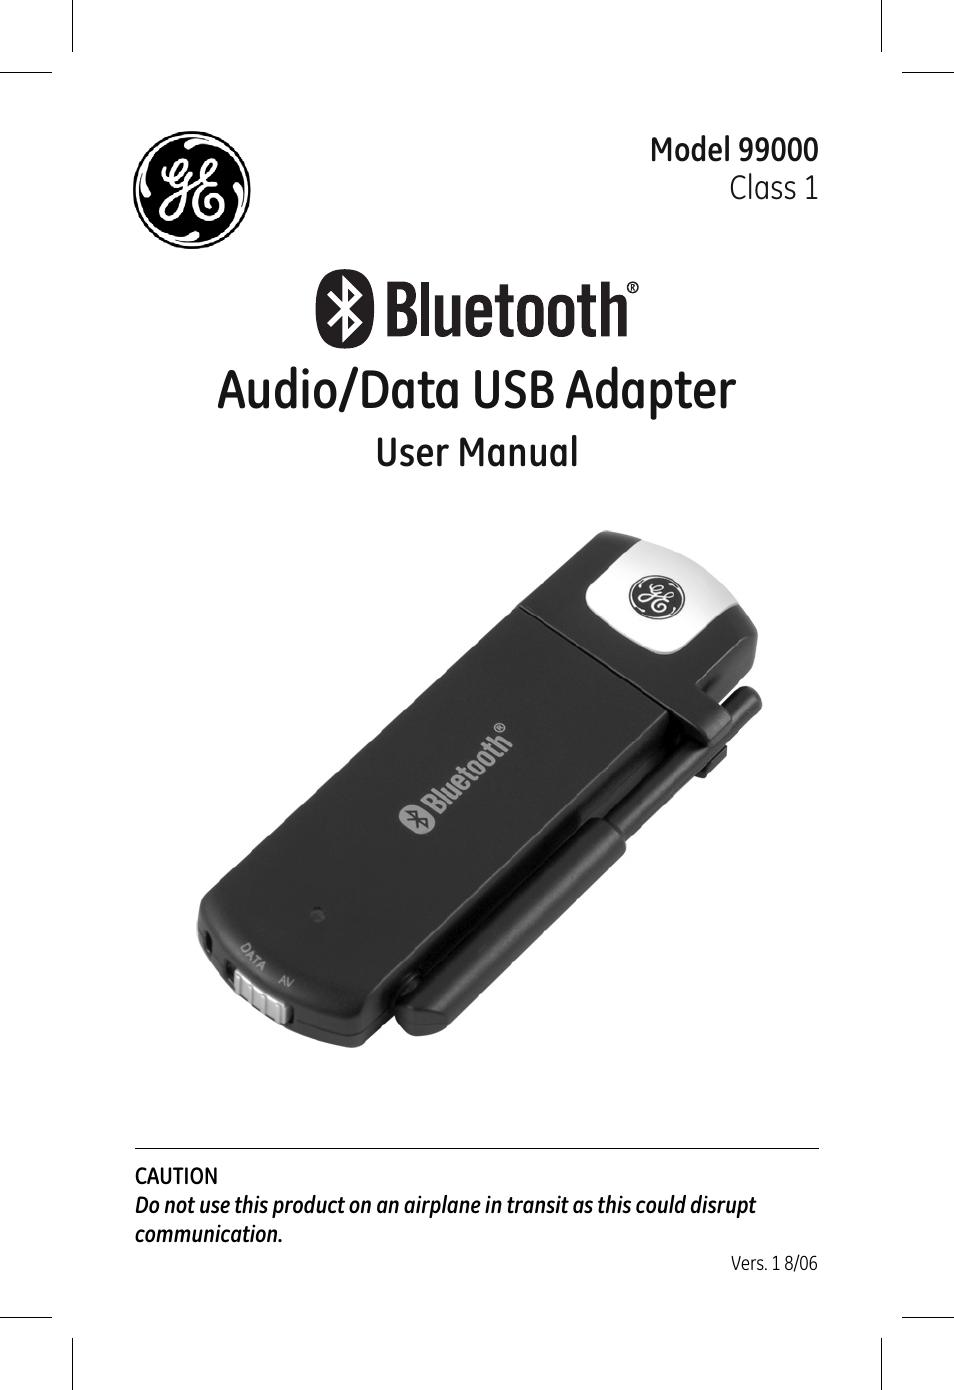 ge 99000 ge bluetooth usb adapter audio   data user manual Old GE Radios Switching Adapter GE